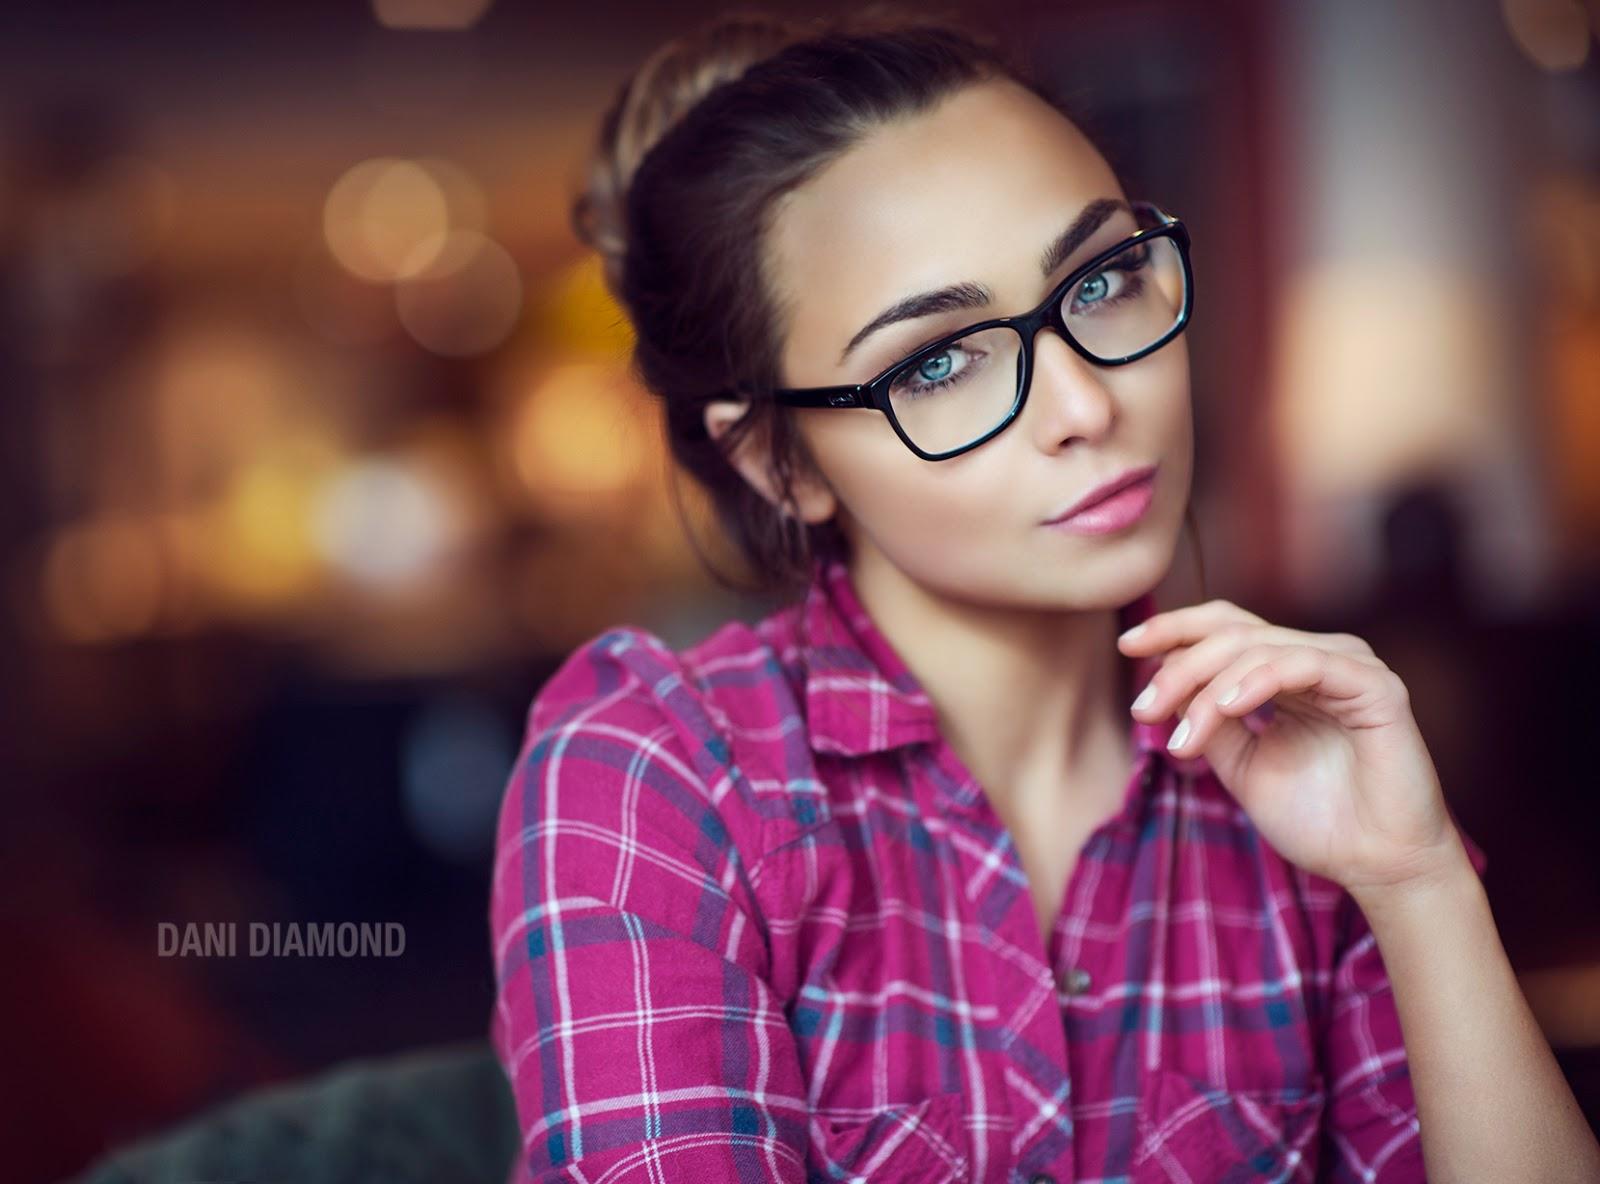 Dani Diamond